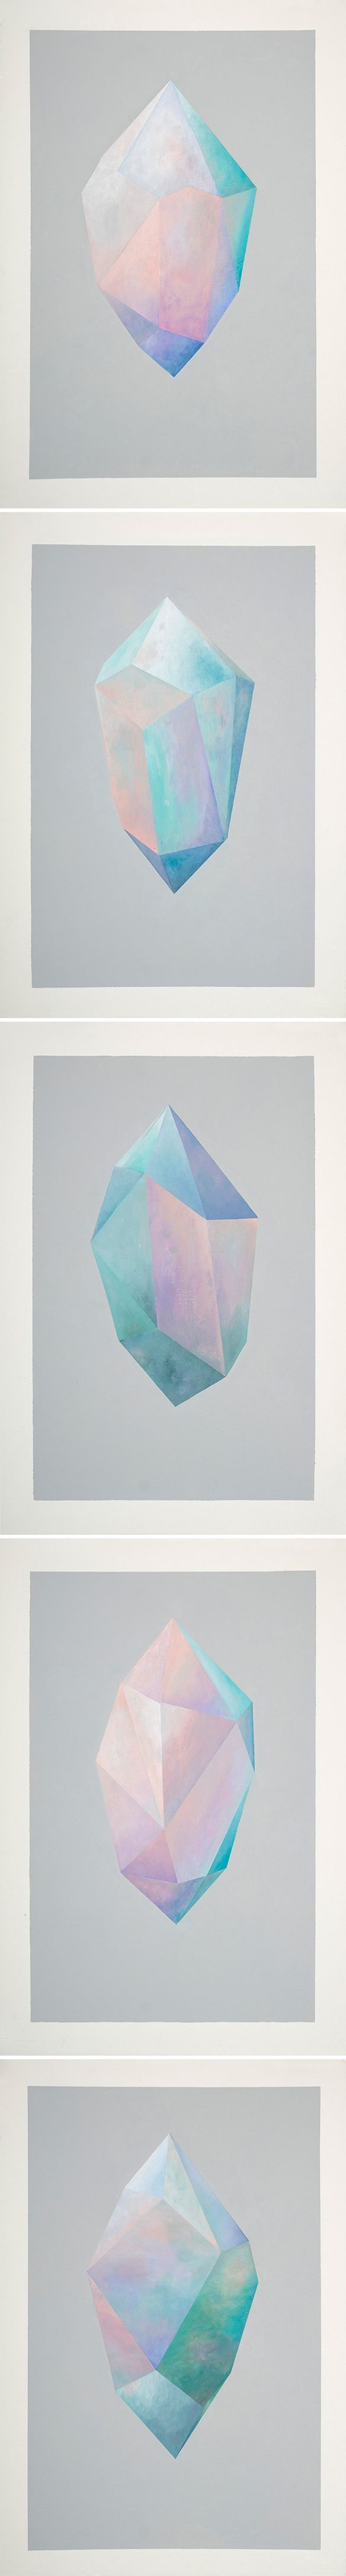 gemstone paintings by rebecca chaperon